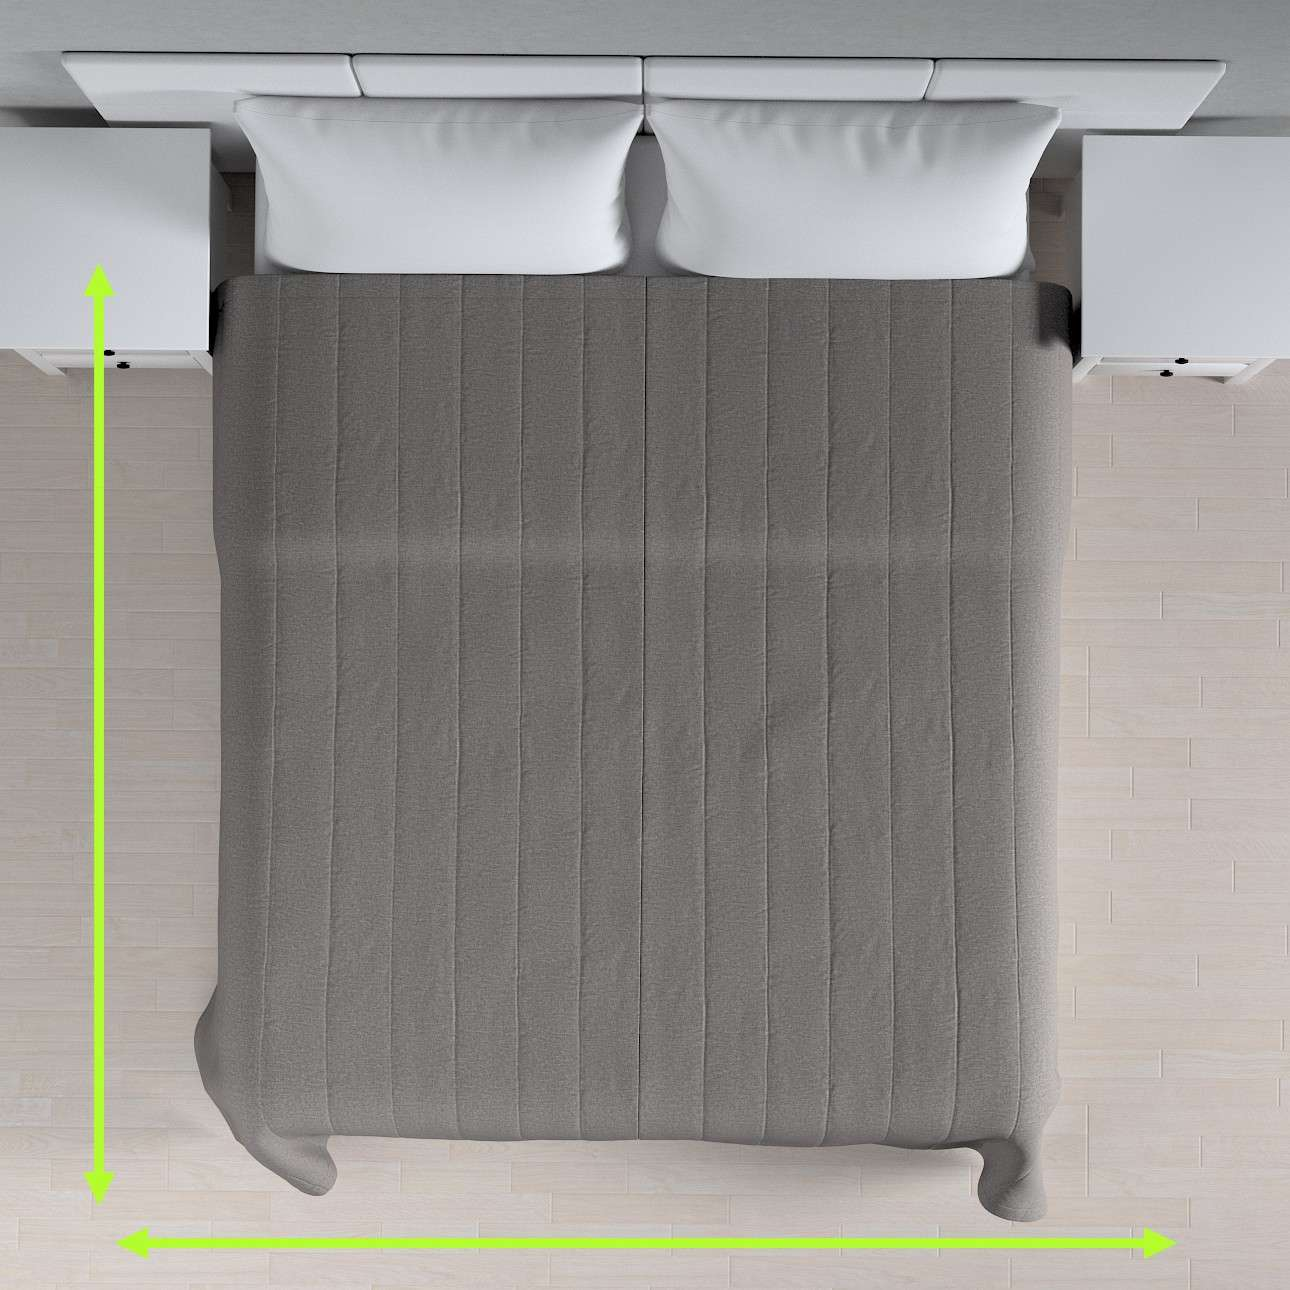 Basic steppelt takaró a kollekcióból Edinburgh Bútorszövet, Dekoranyag: 115-81